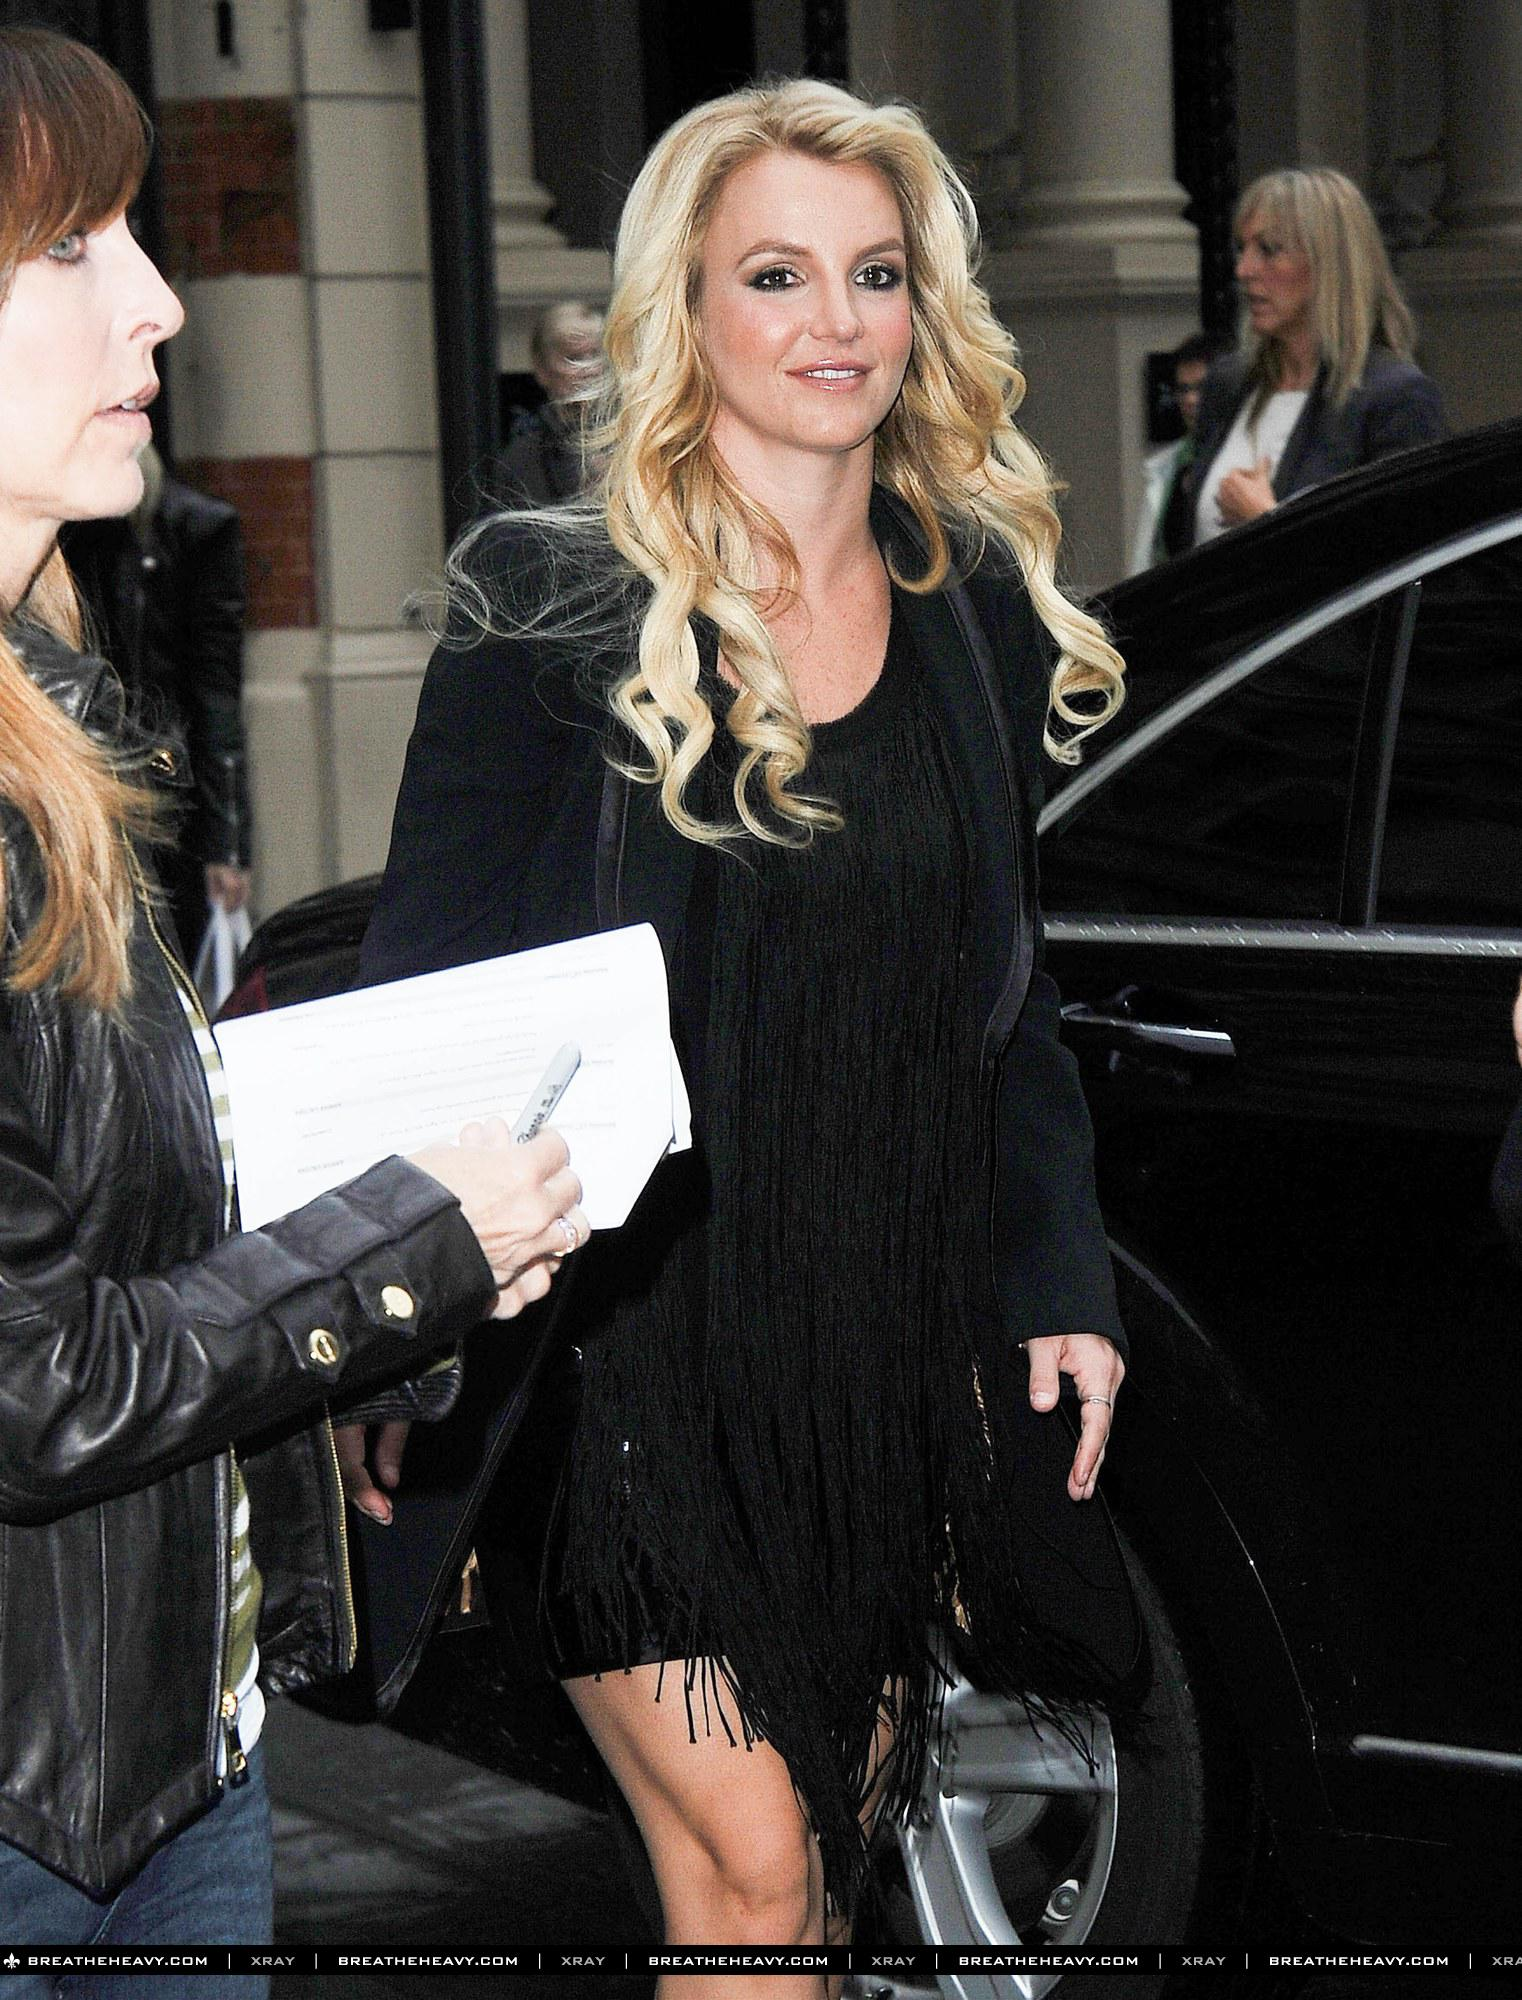 Britney Spears Londra 2